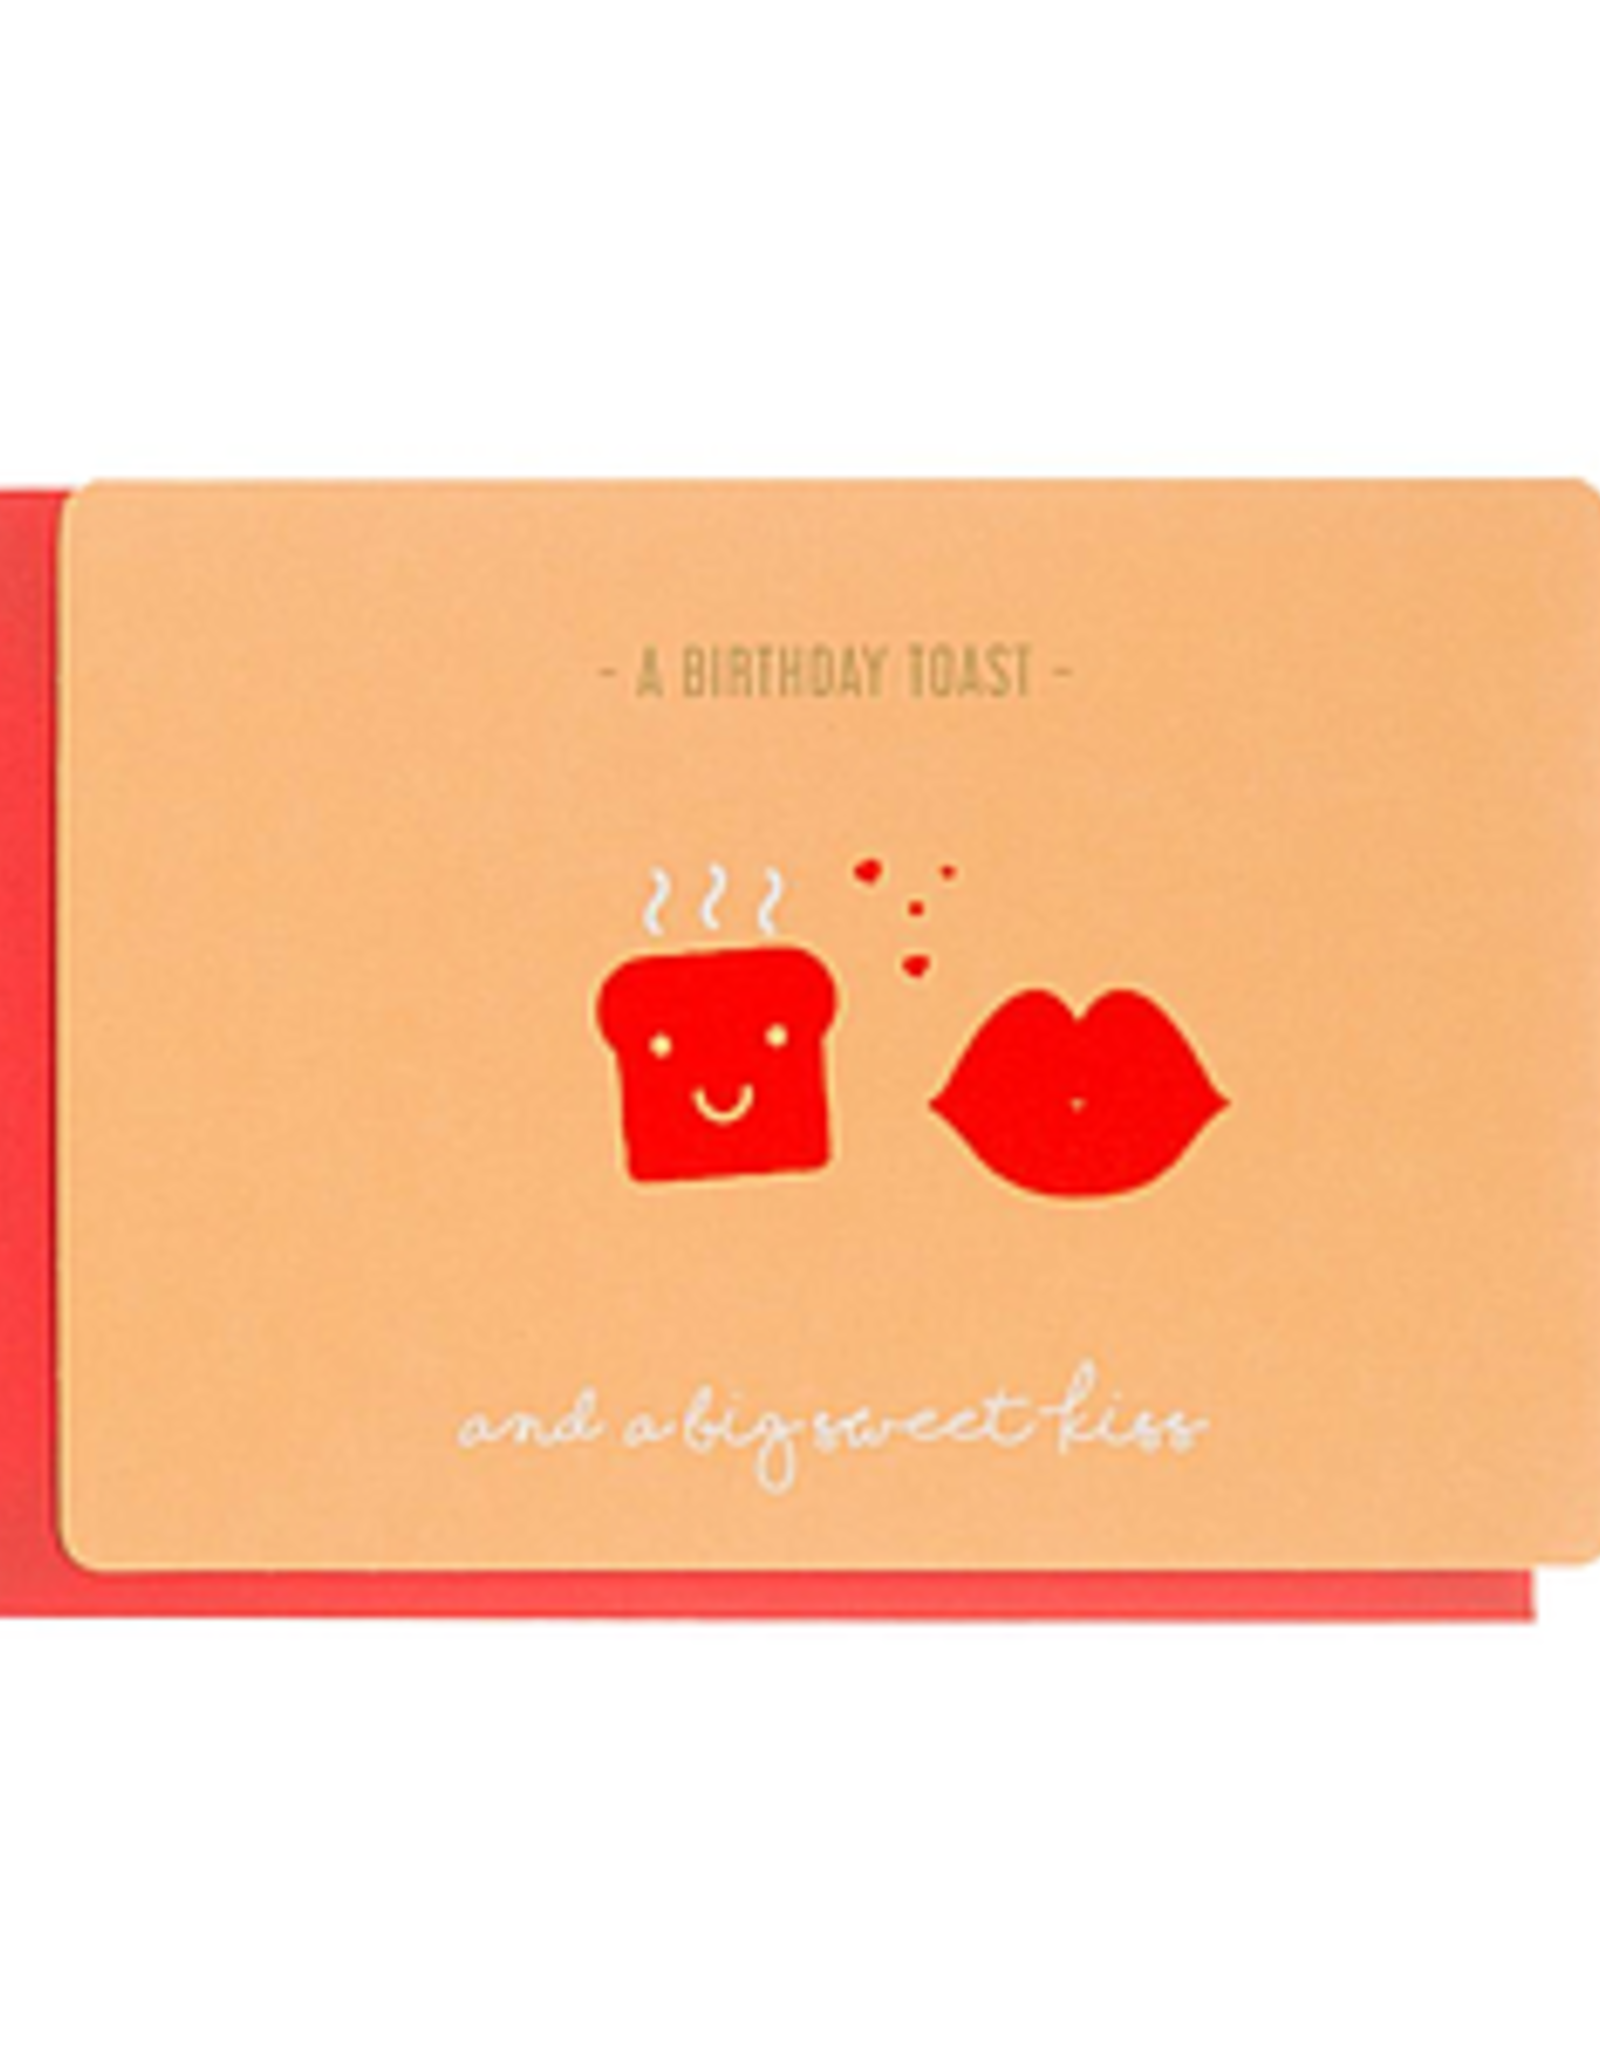 Enfant Terrible Dubbele wenskaart Enfant terrible: A birthday toast and a big sweet kiss